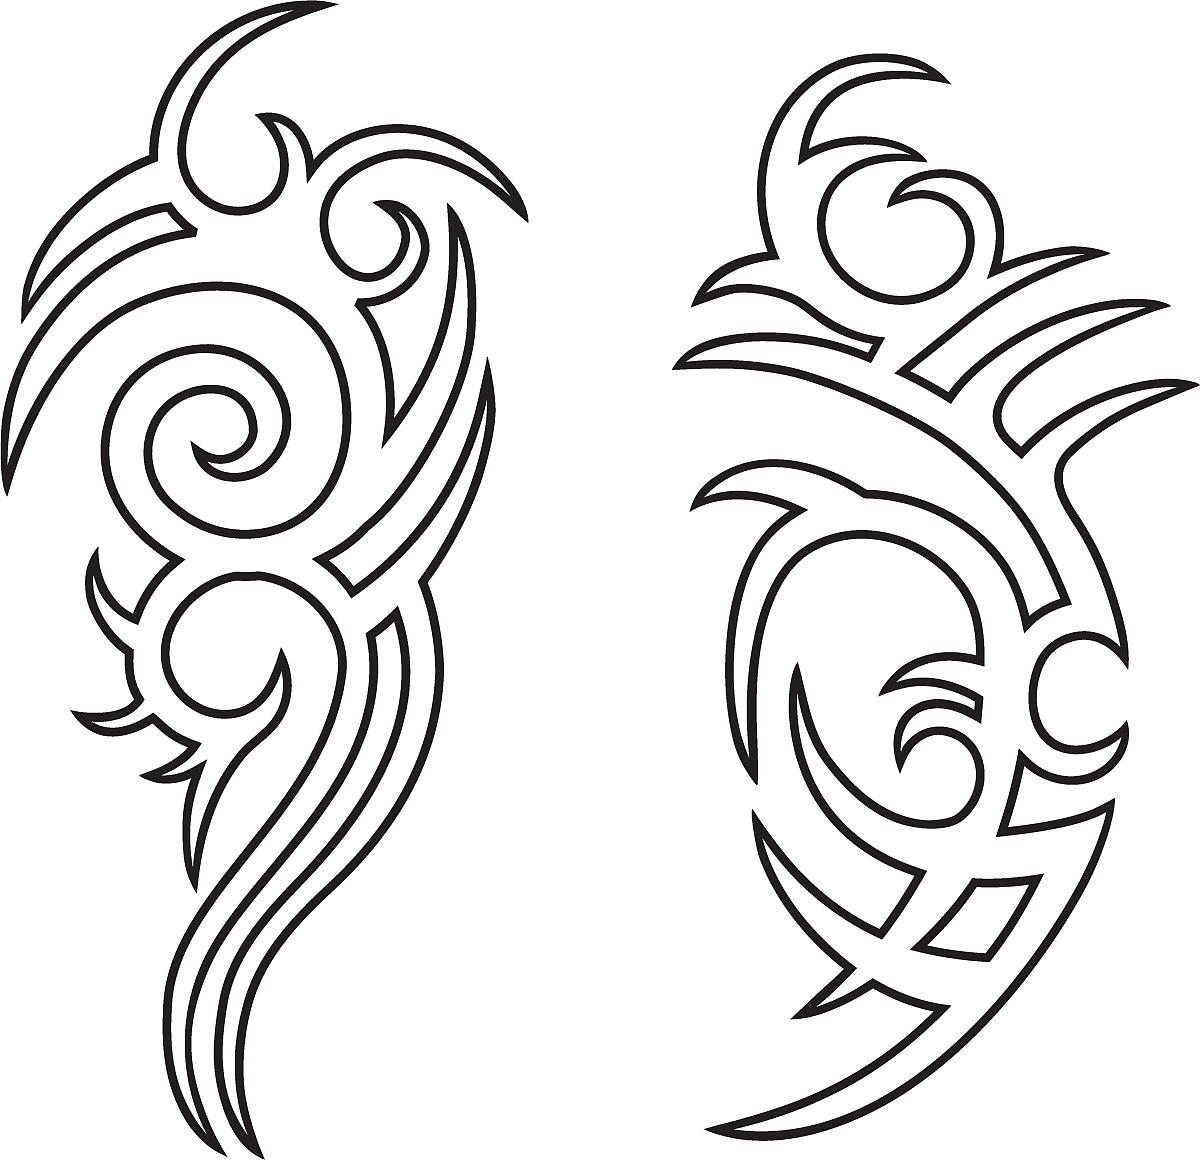 Tribal Tattoo Line Drawing : 后背纹身线条图案大全 女后背纹身图案大全 纹身图案九尾狐后背 纹身图案女 线条龙纹身图案大全